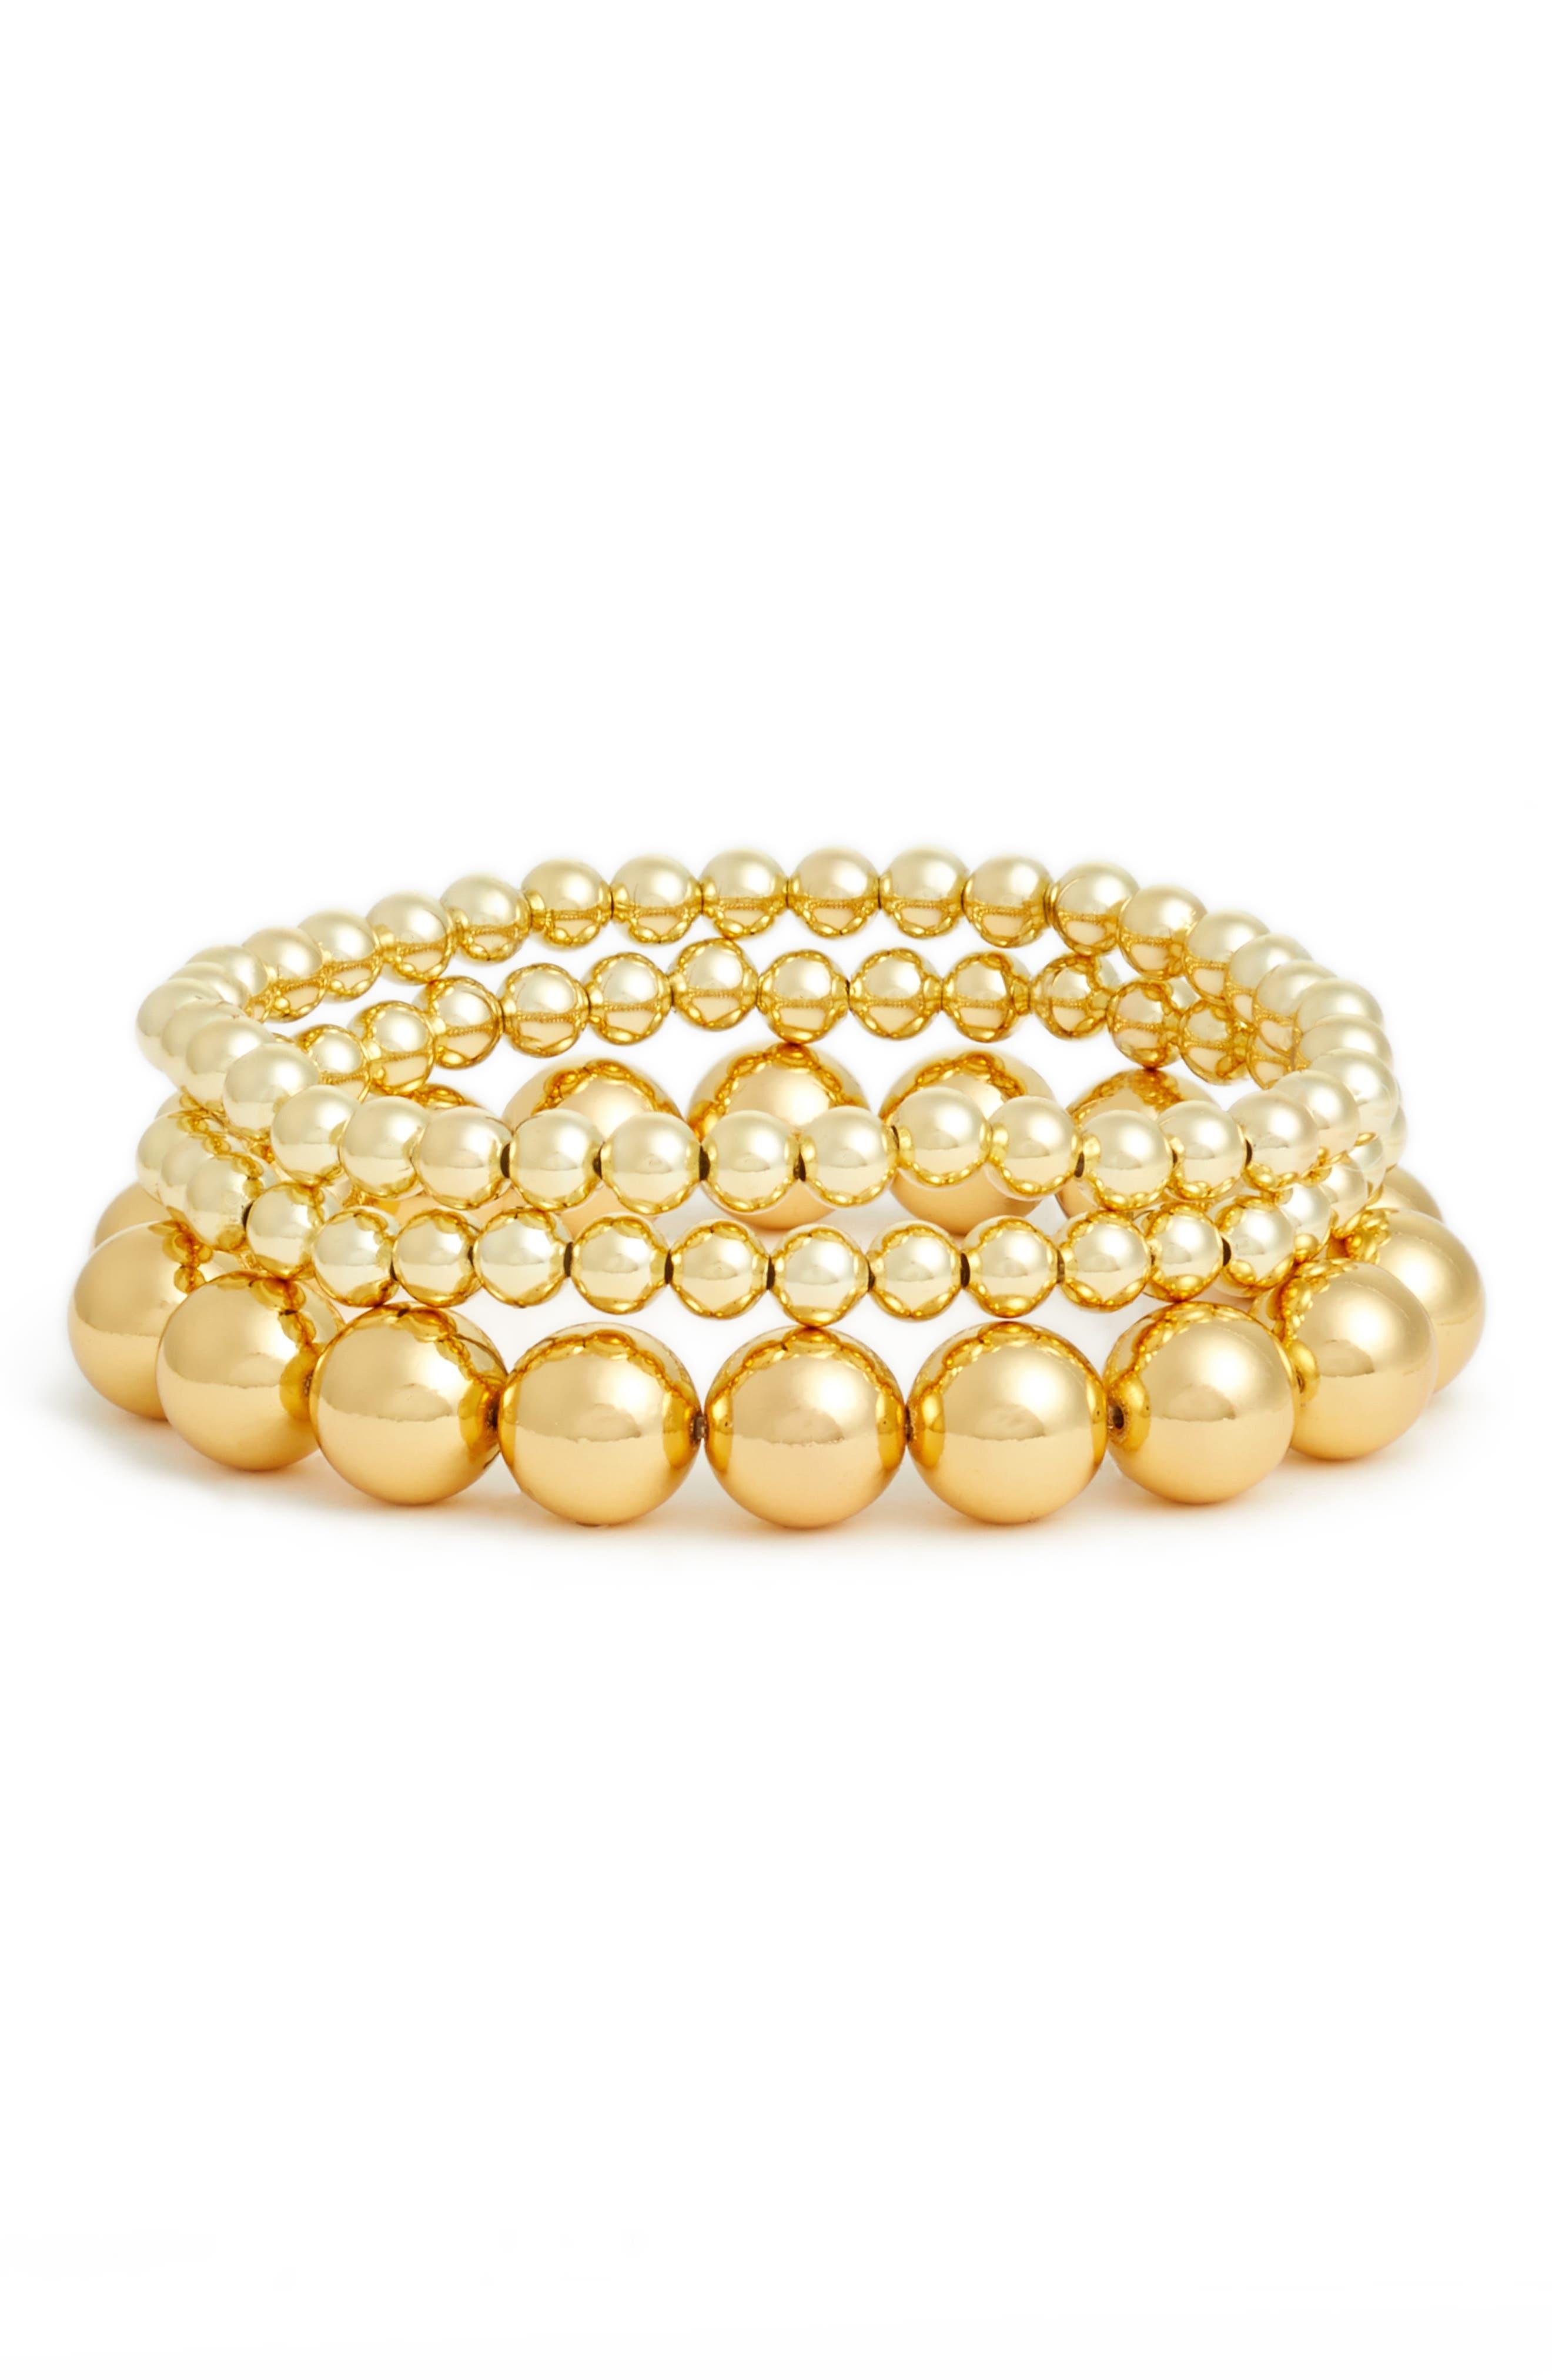 Newport Set of 3 Bead Bracelets,                             Main thumbnail 1, color,                             710